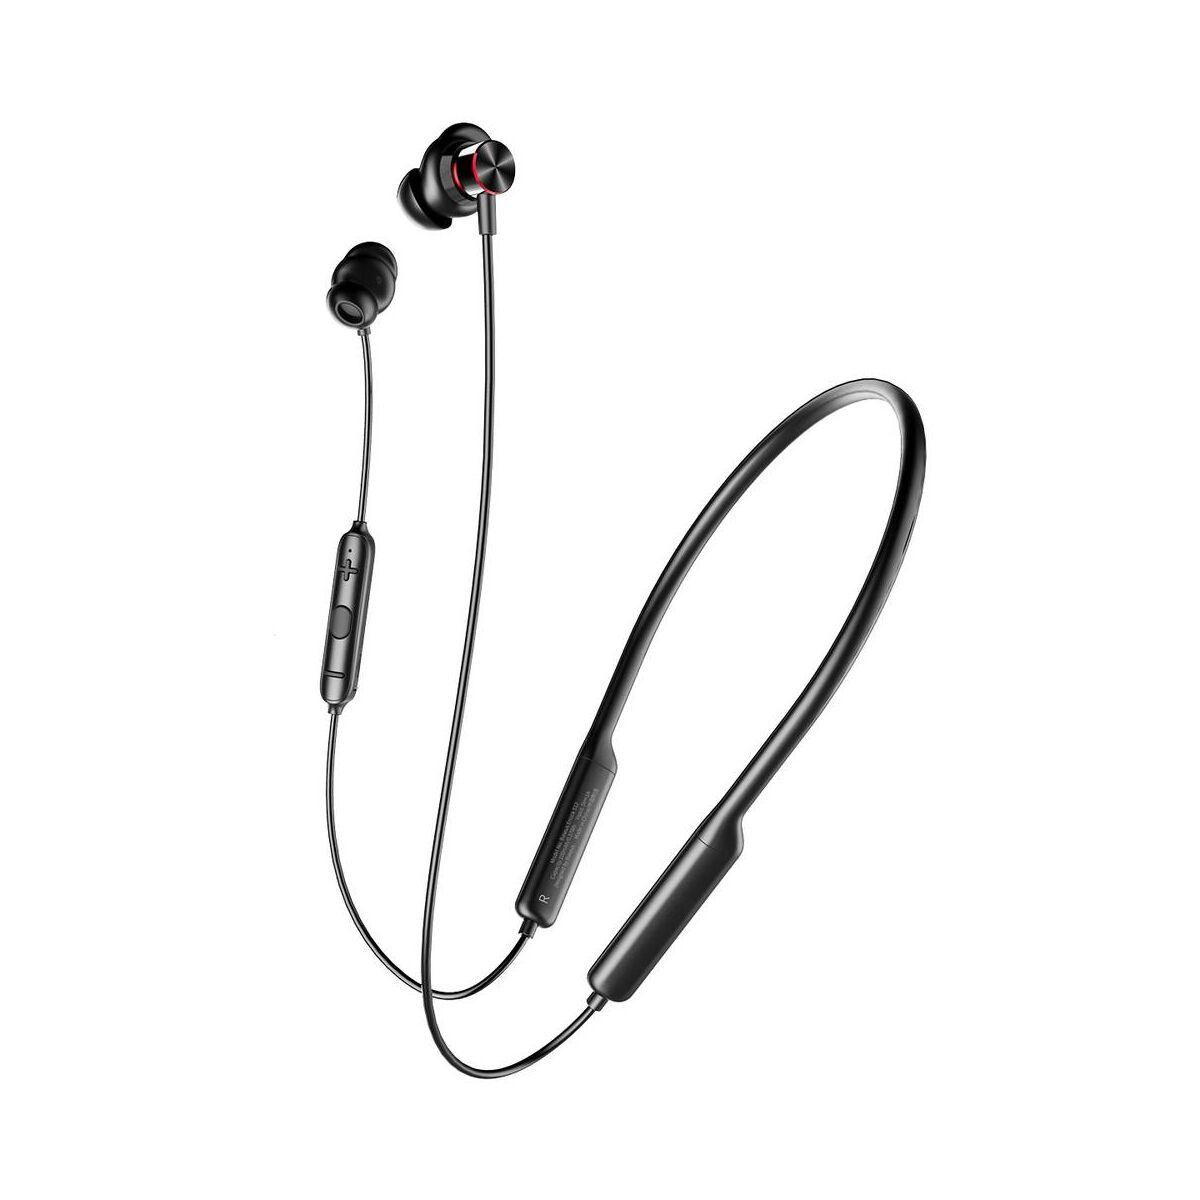 Baseus fülhallgató, Bluetooth Encok S12, fekete (NGS12-01)